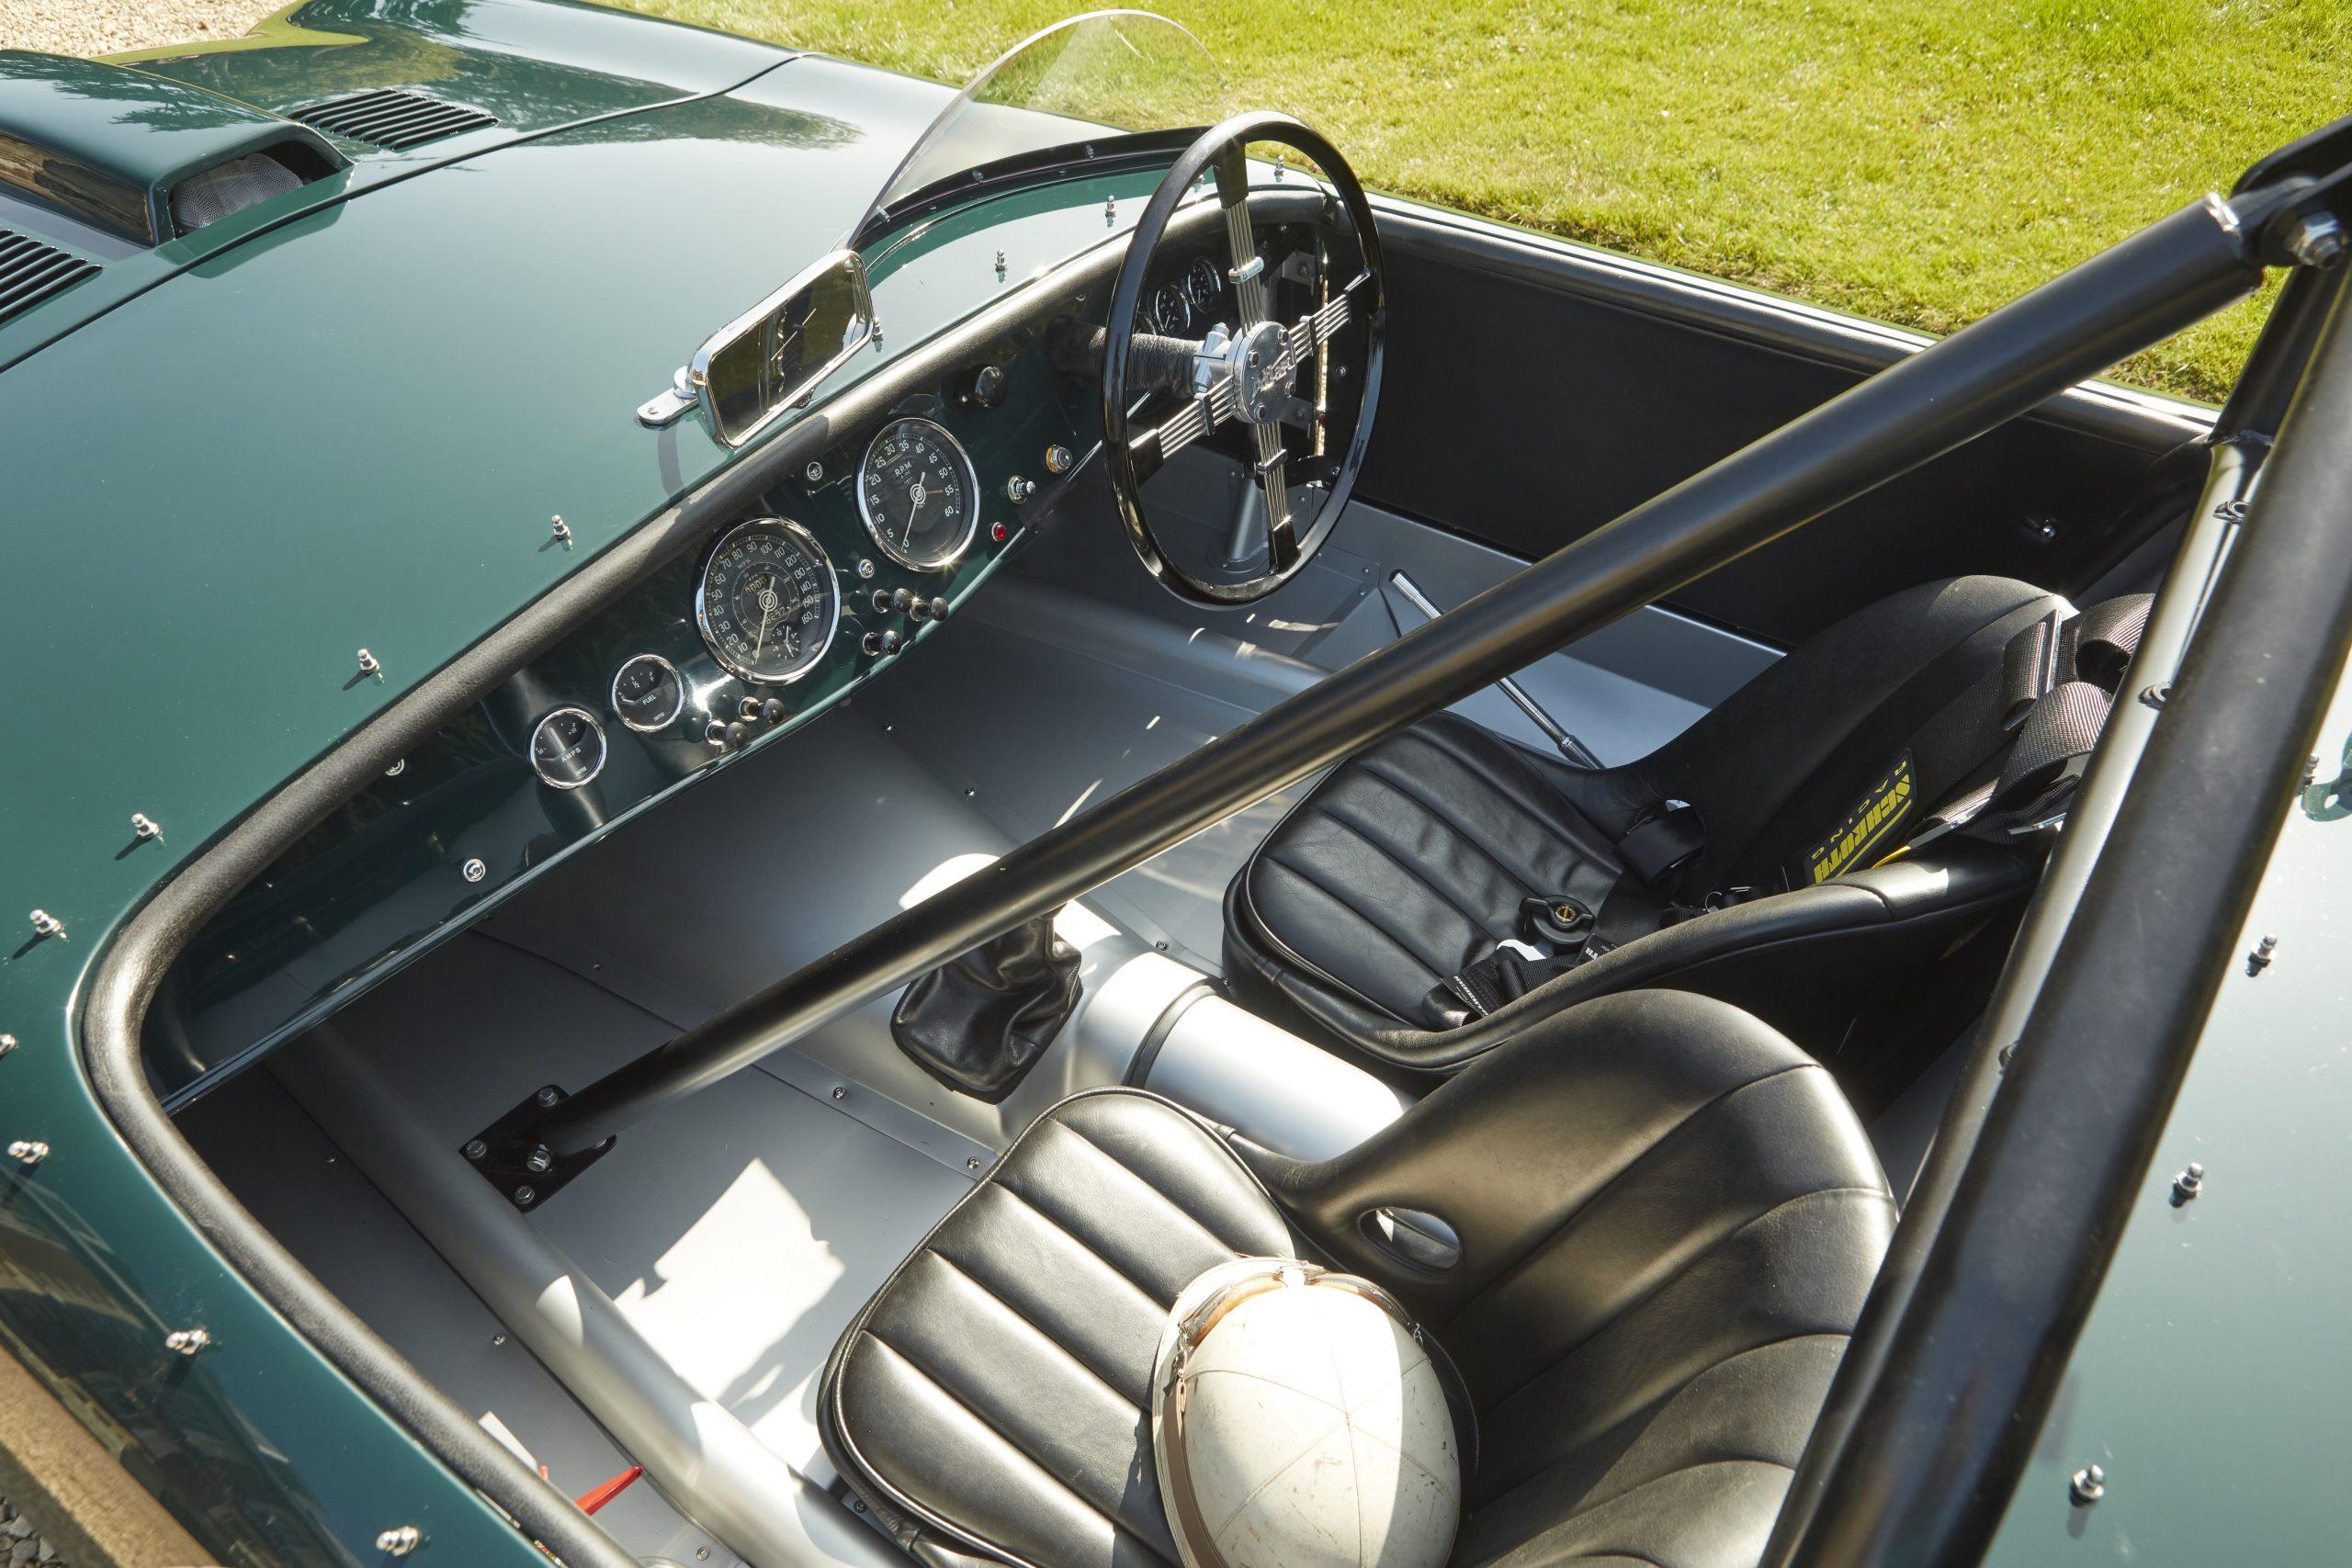 Allard Motor Company JR Continuation car cockpit